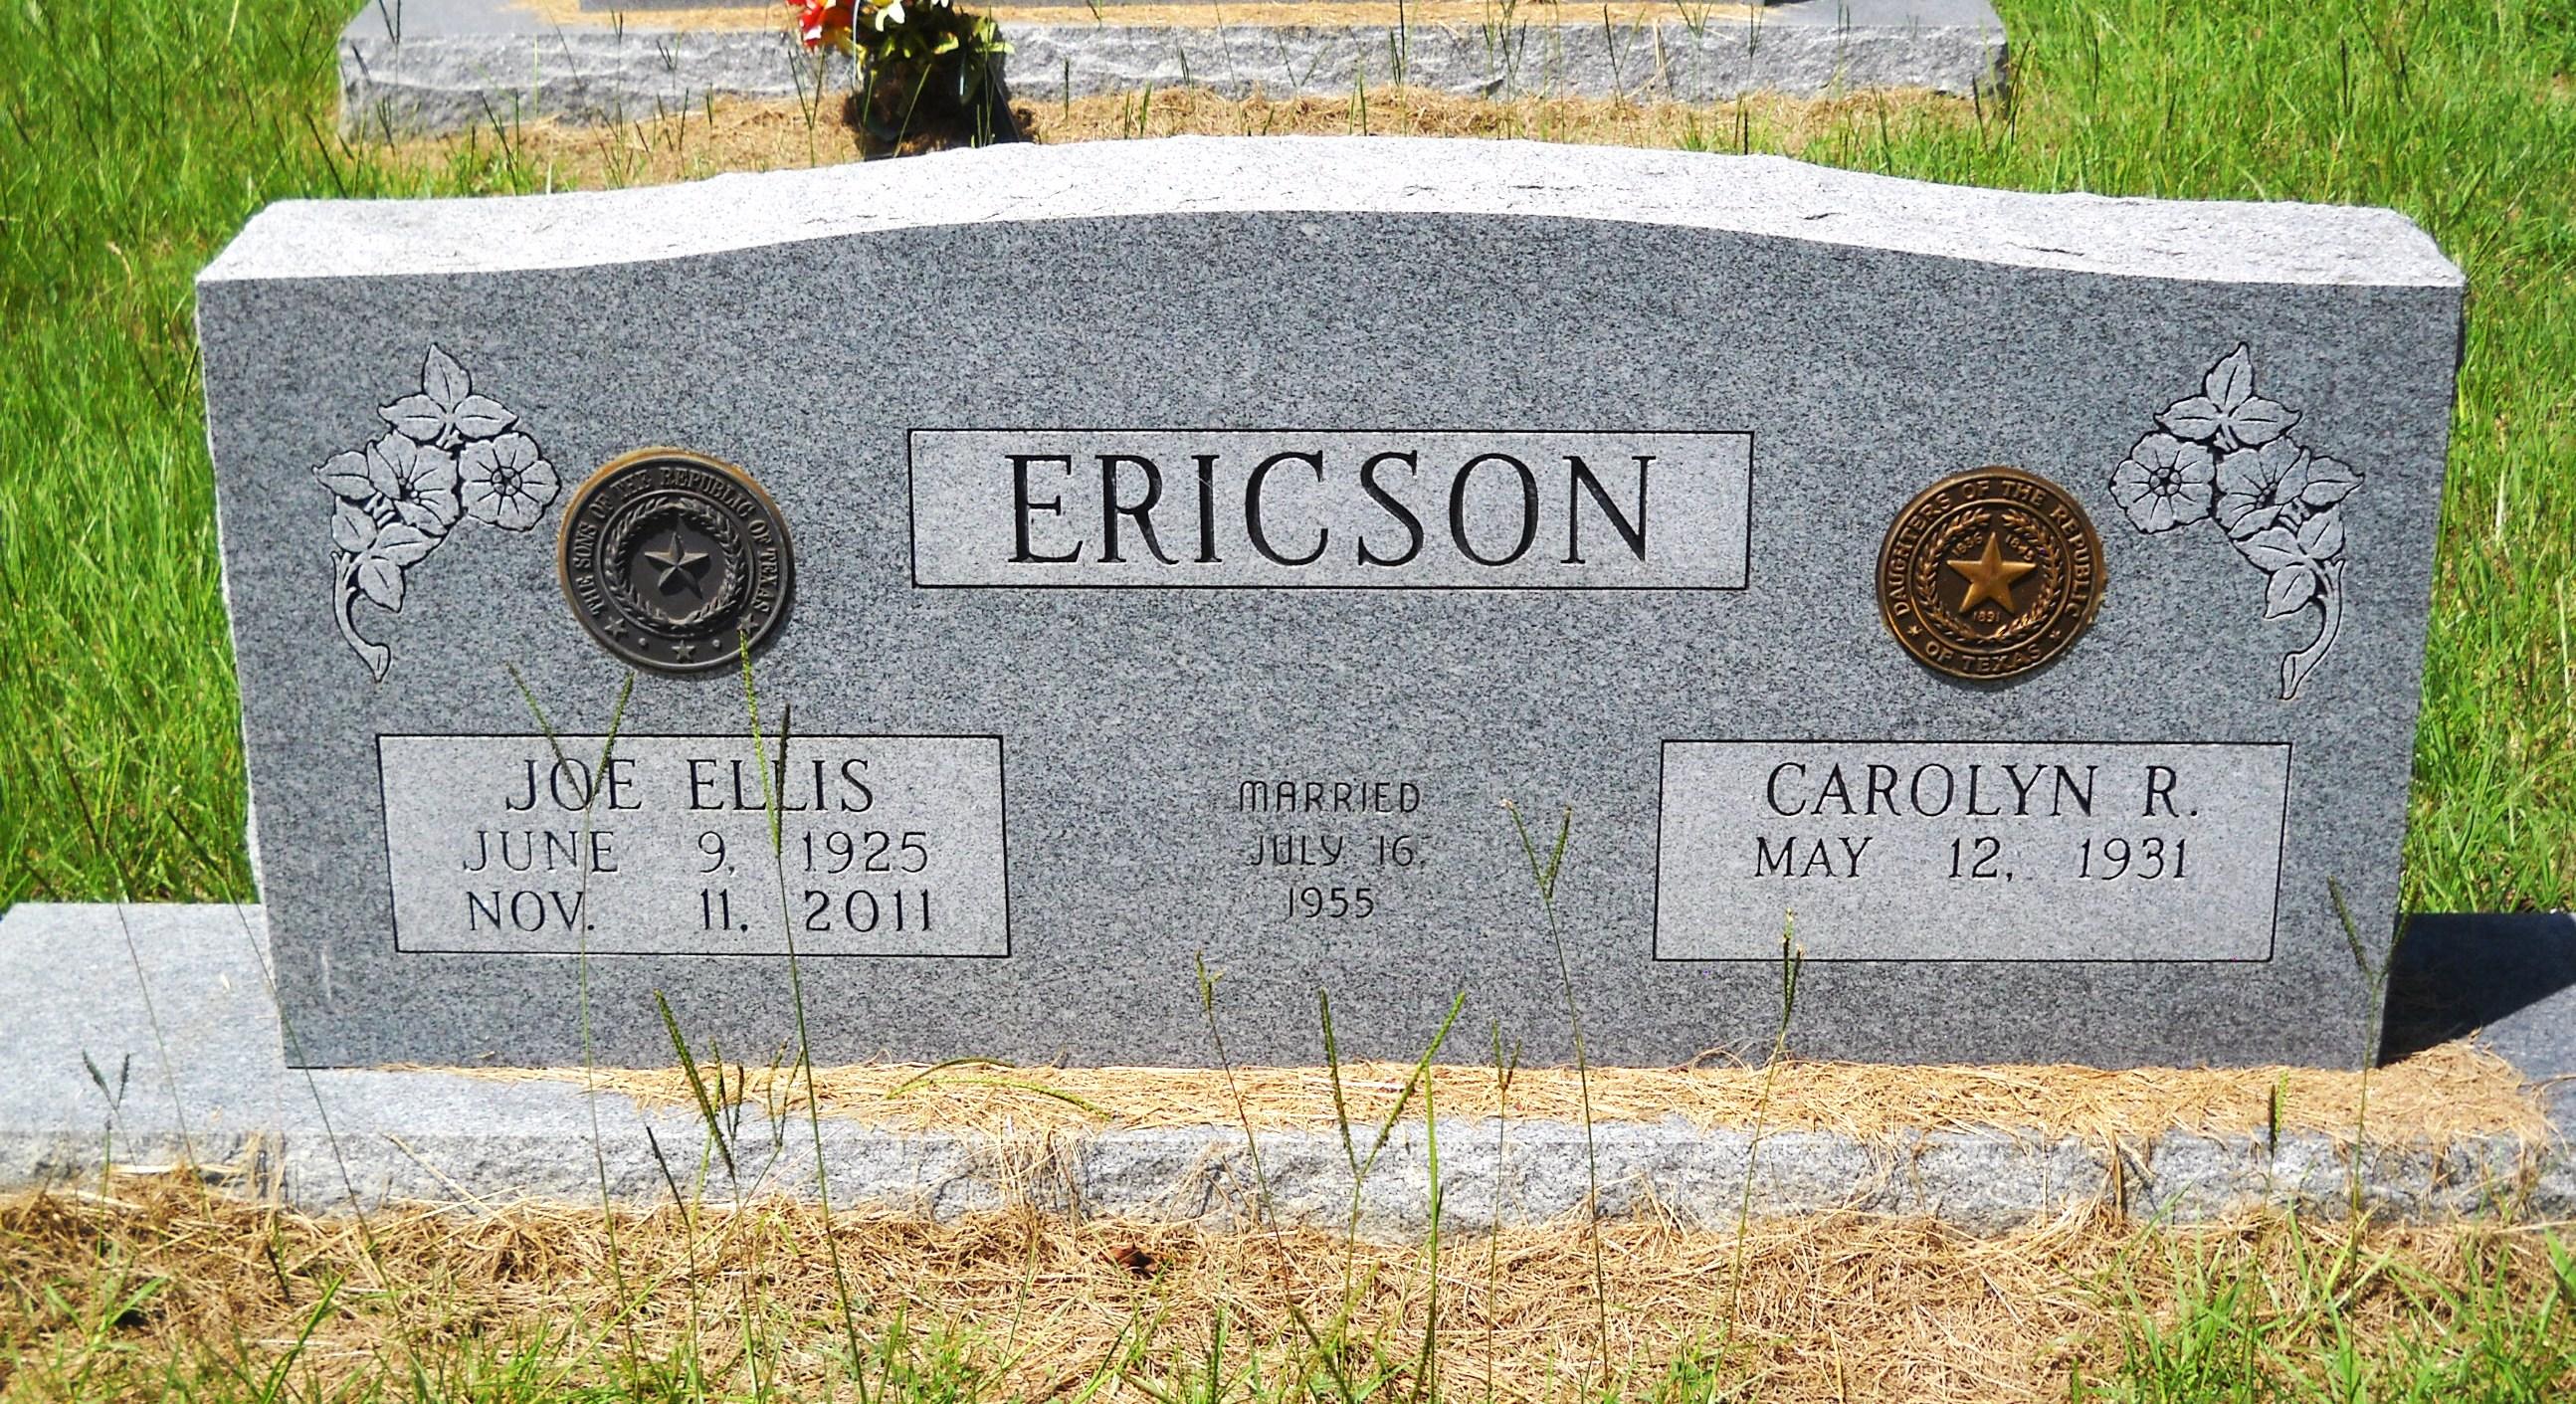 Dr Joe Ellis Ericson